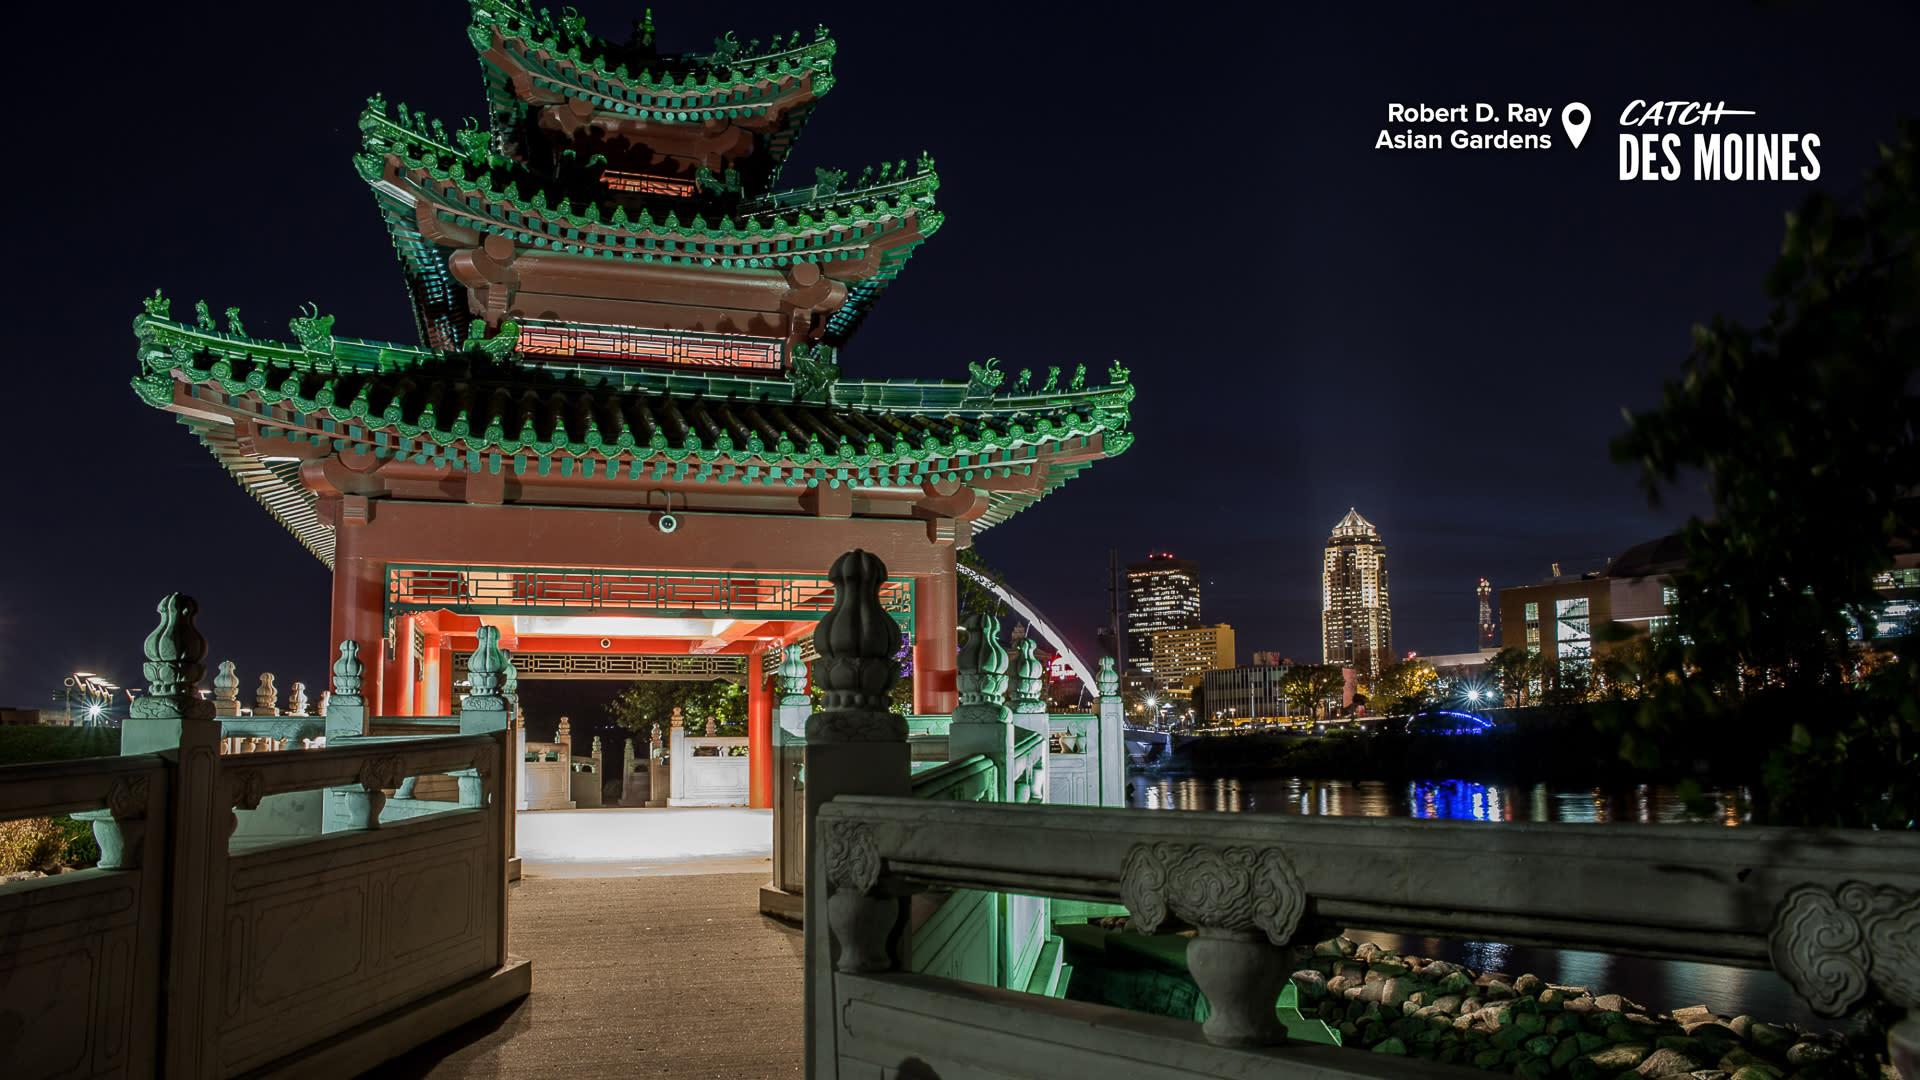 Robert D. Ray Asian Gardens Zoom Background